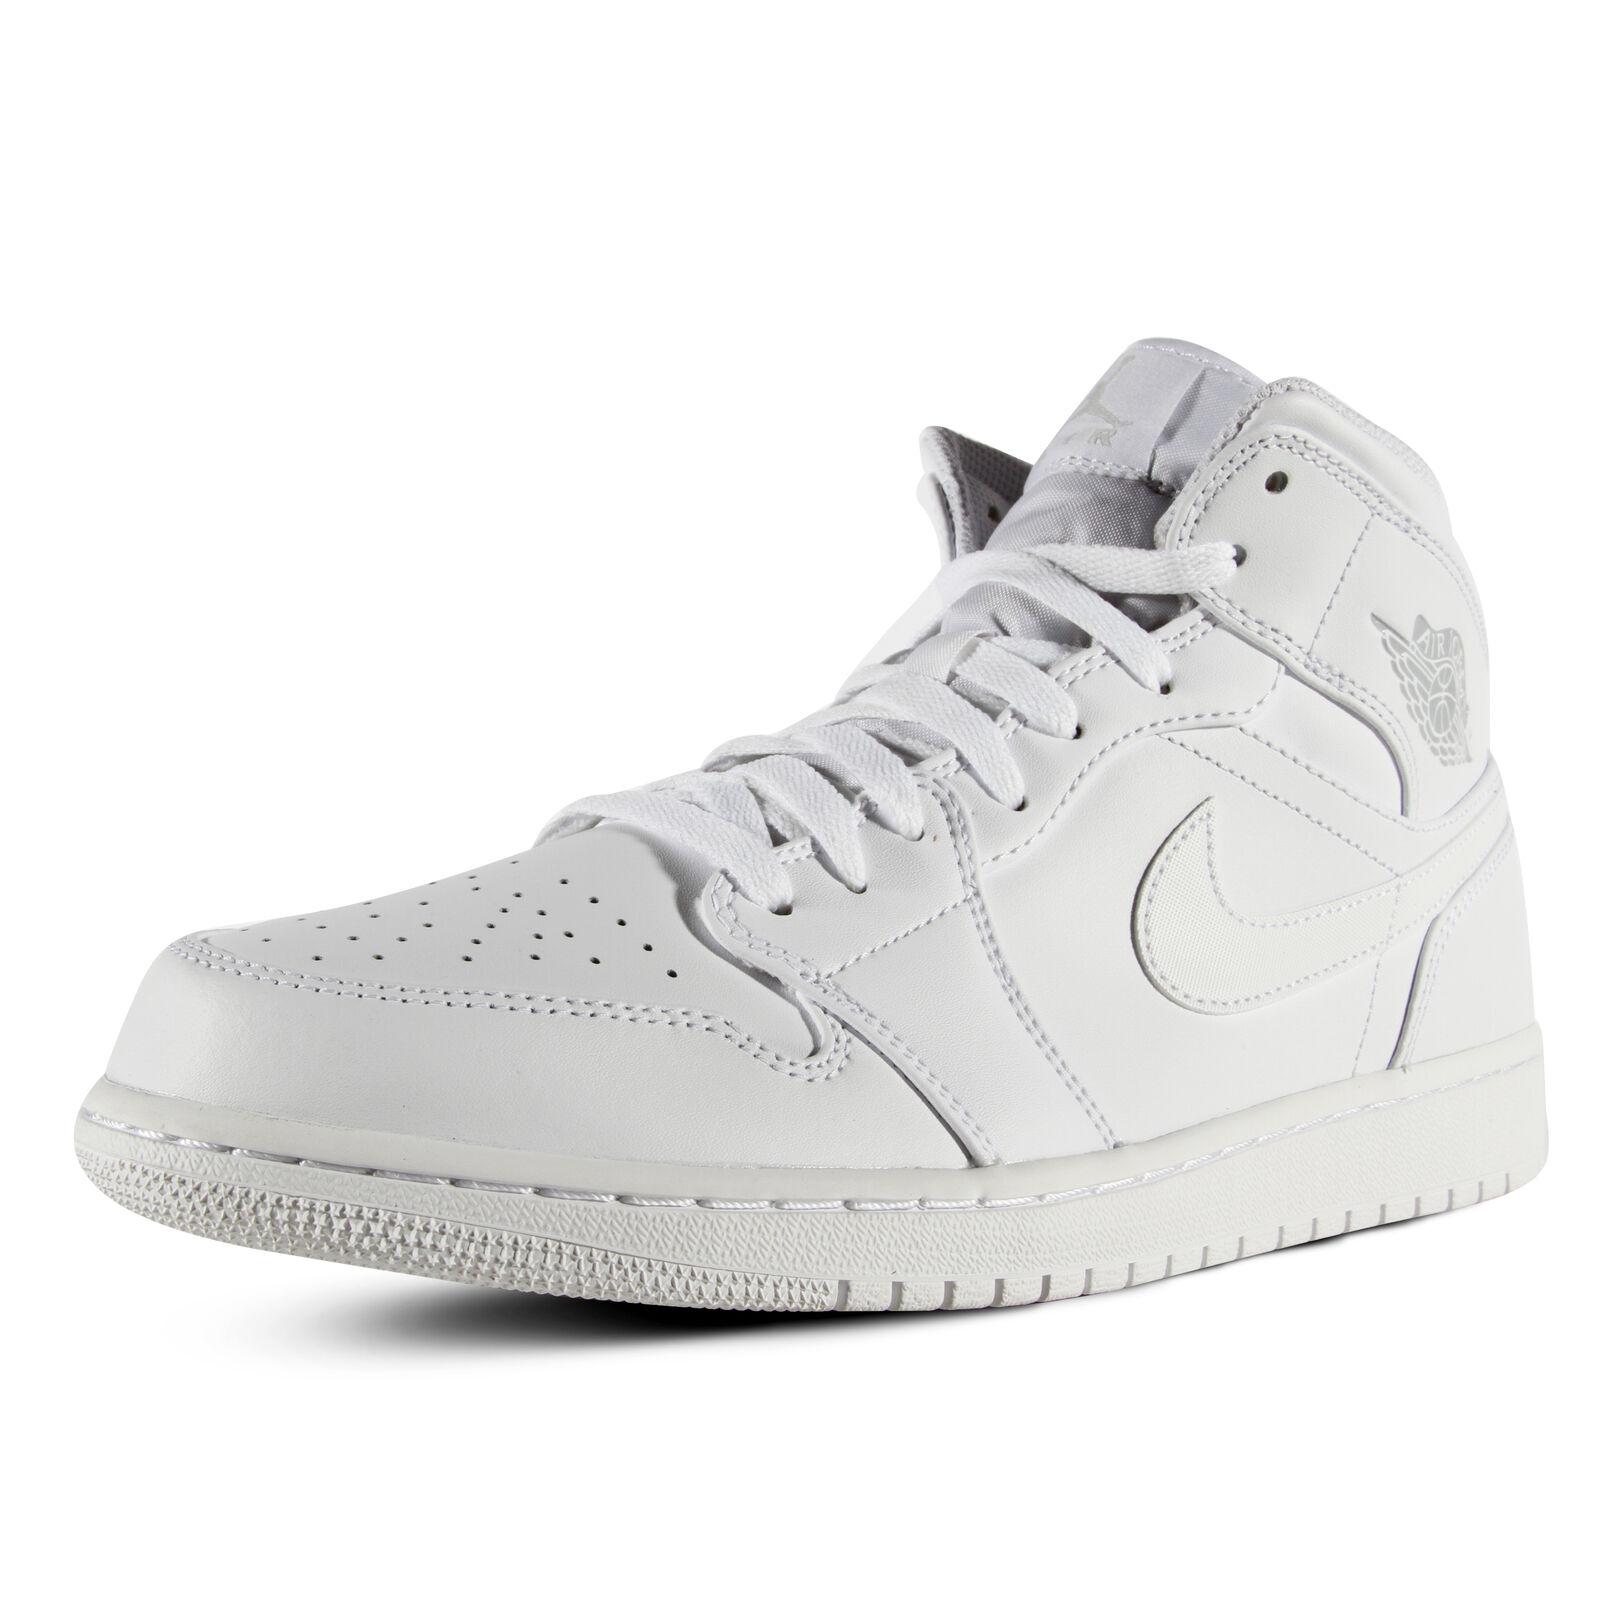 a7595d95f82 ... coupon for nike air jordan 1 mid aj1 white pure platinum men shoes  sneakers bef58 d29dd